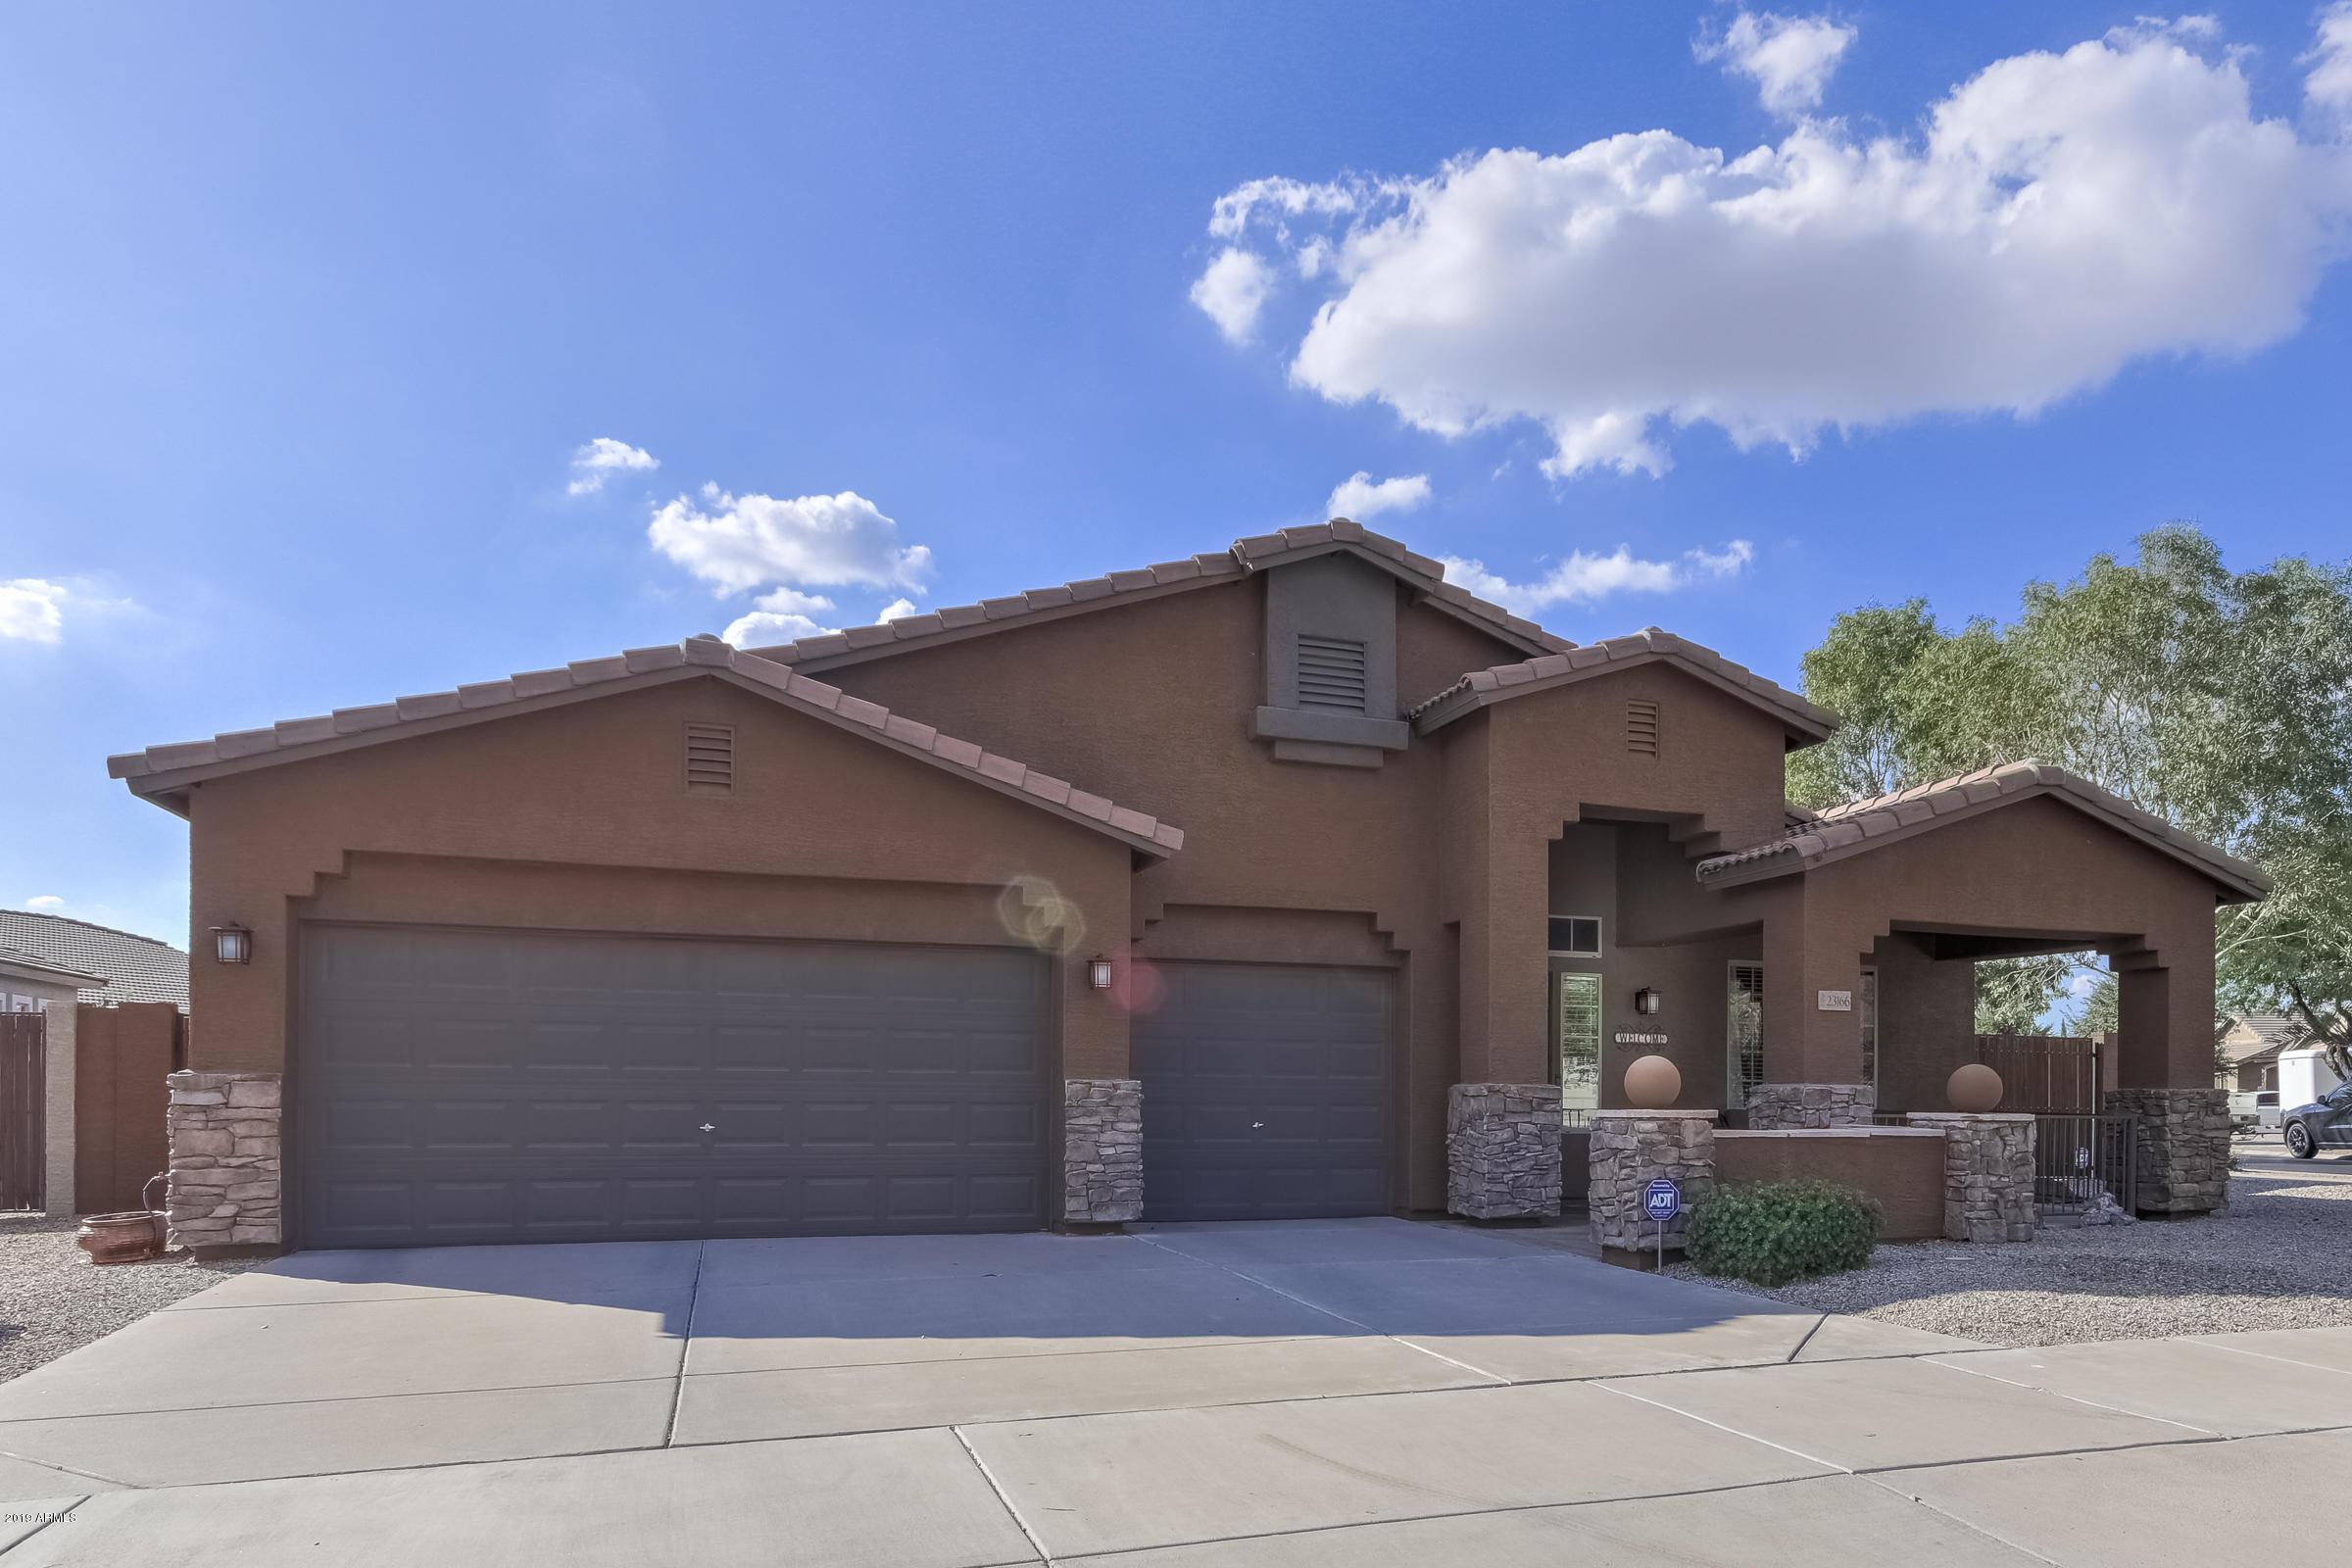 Photo of 23166 S 215TH Street, Queen Creek, AZ 85142